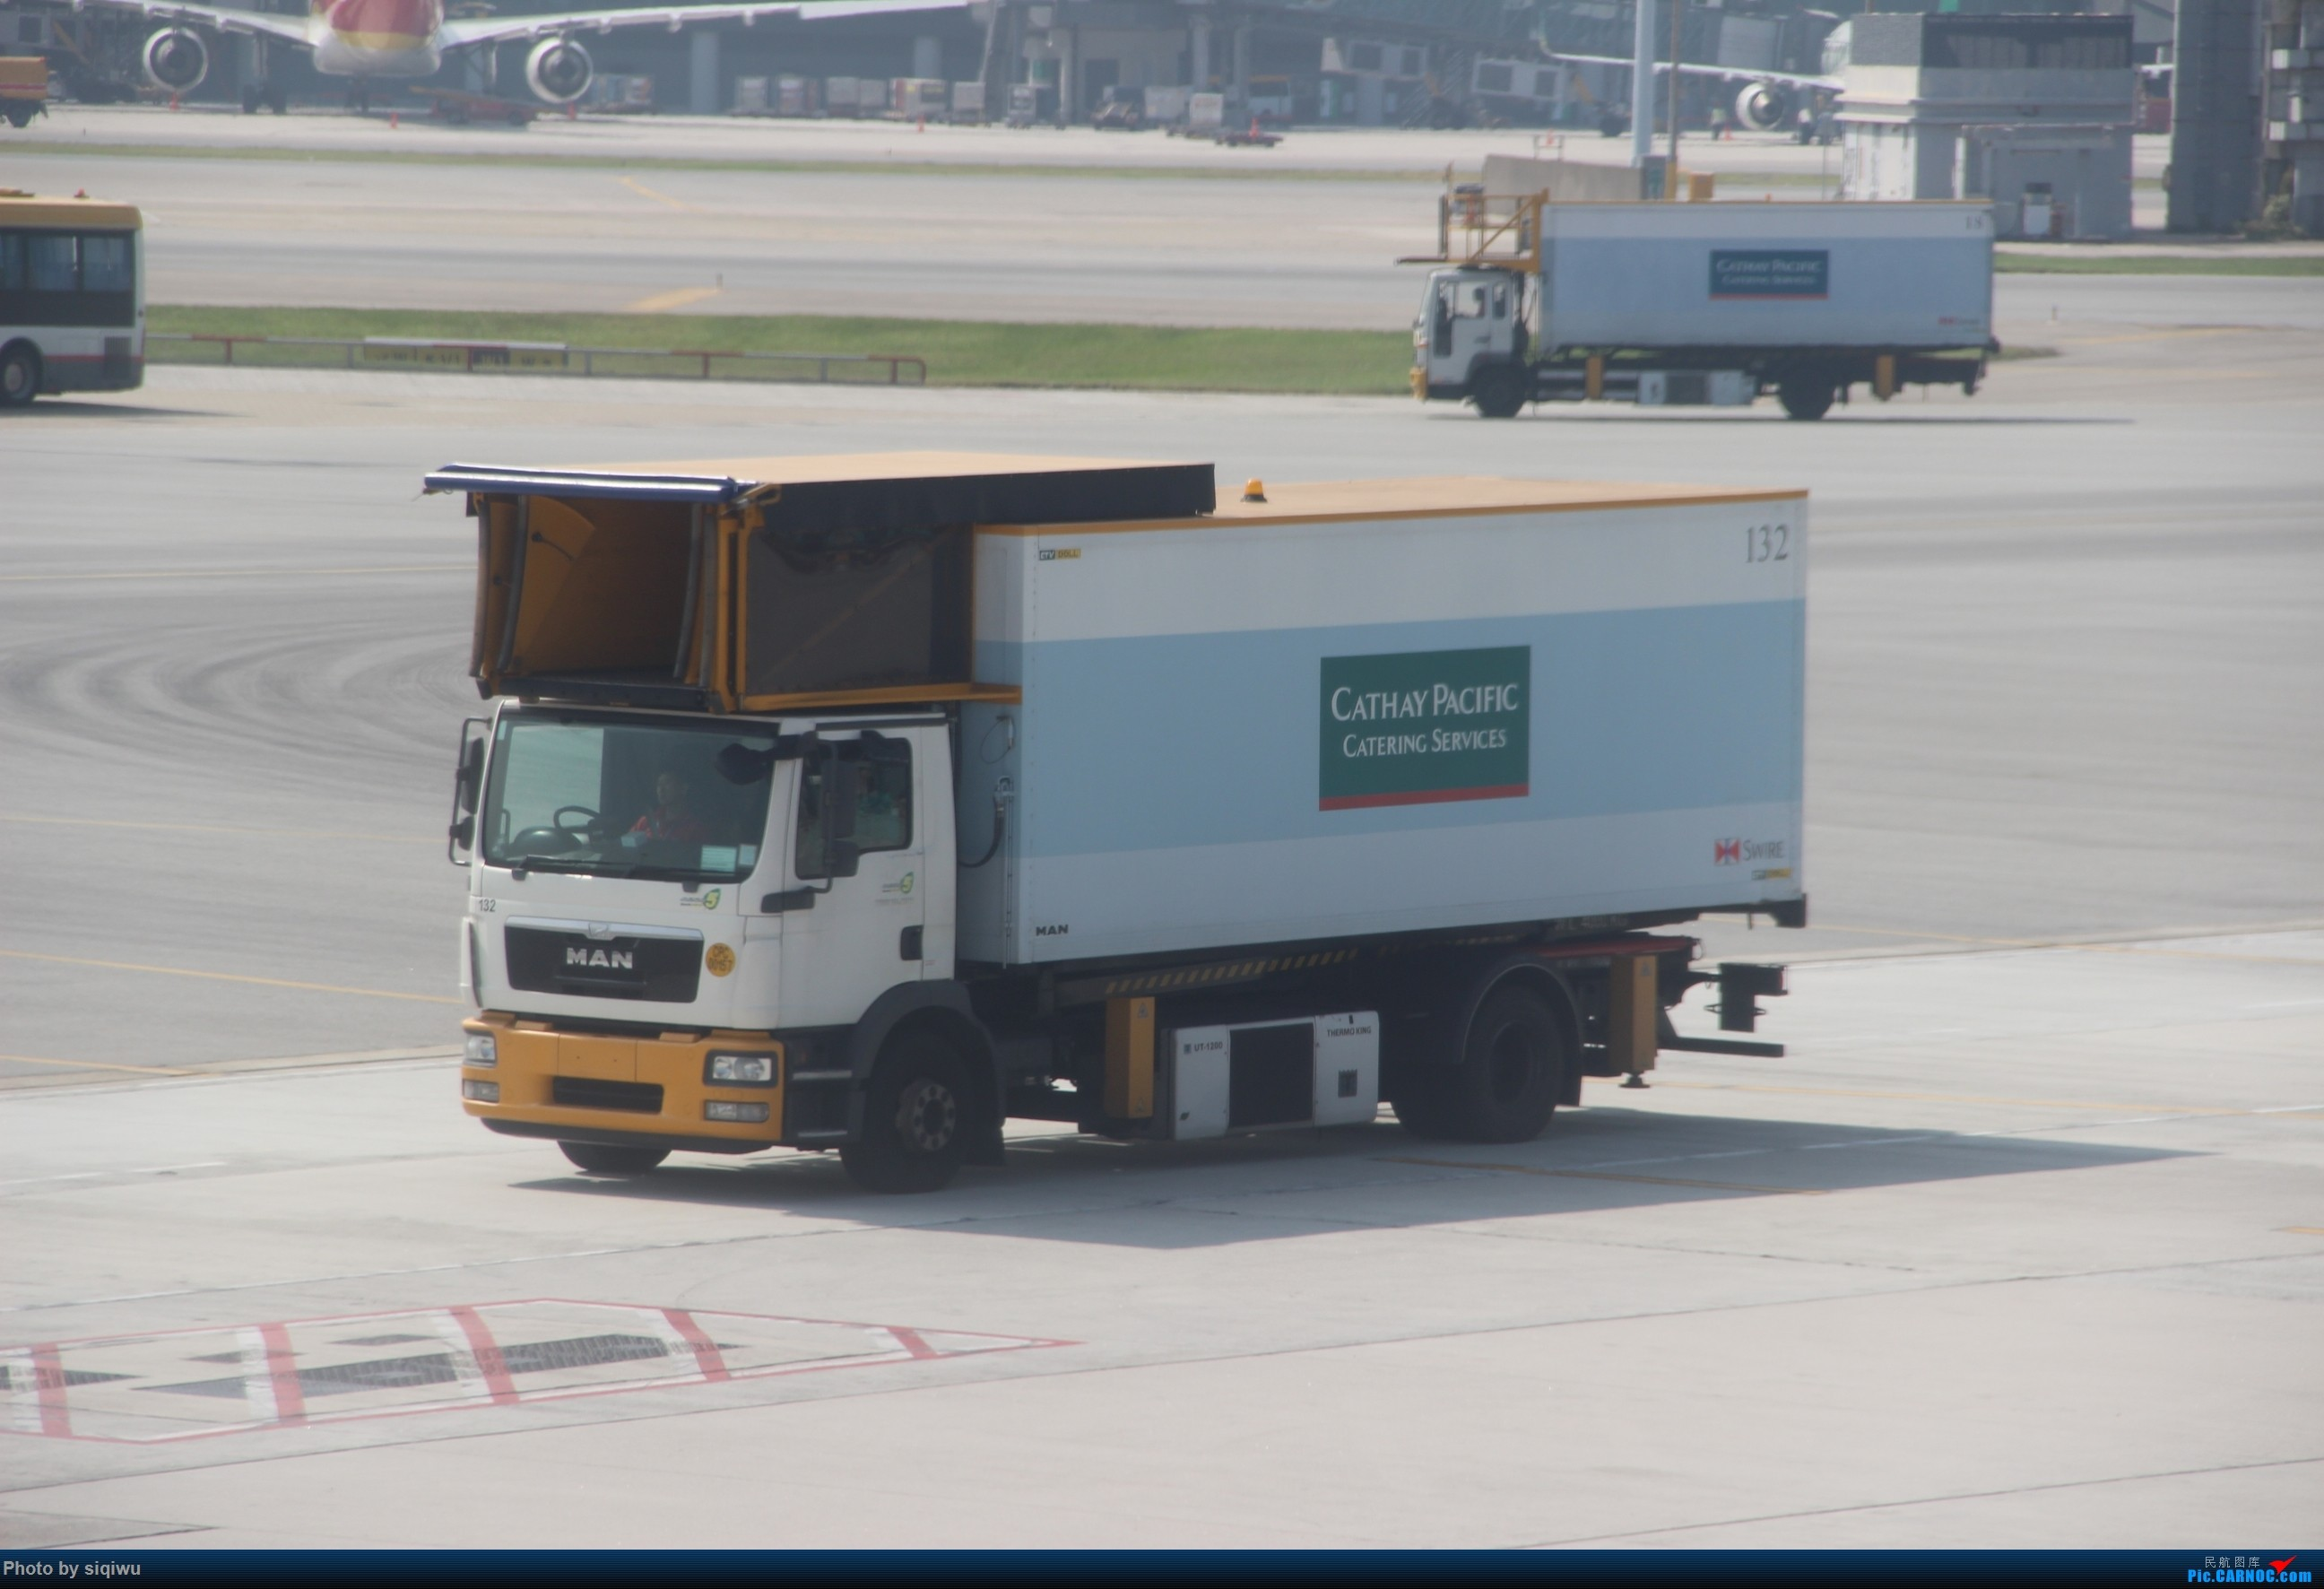 Re:[原创]PVG-HKG-KUL-HKG-PVG 四天往返,CX/KA AIRBUS A320-200  中国香港国际机场 中国香港国际机场